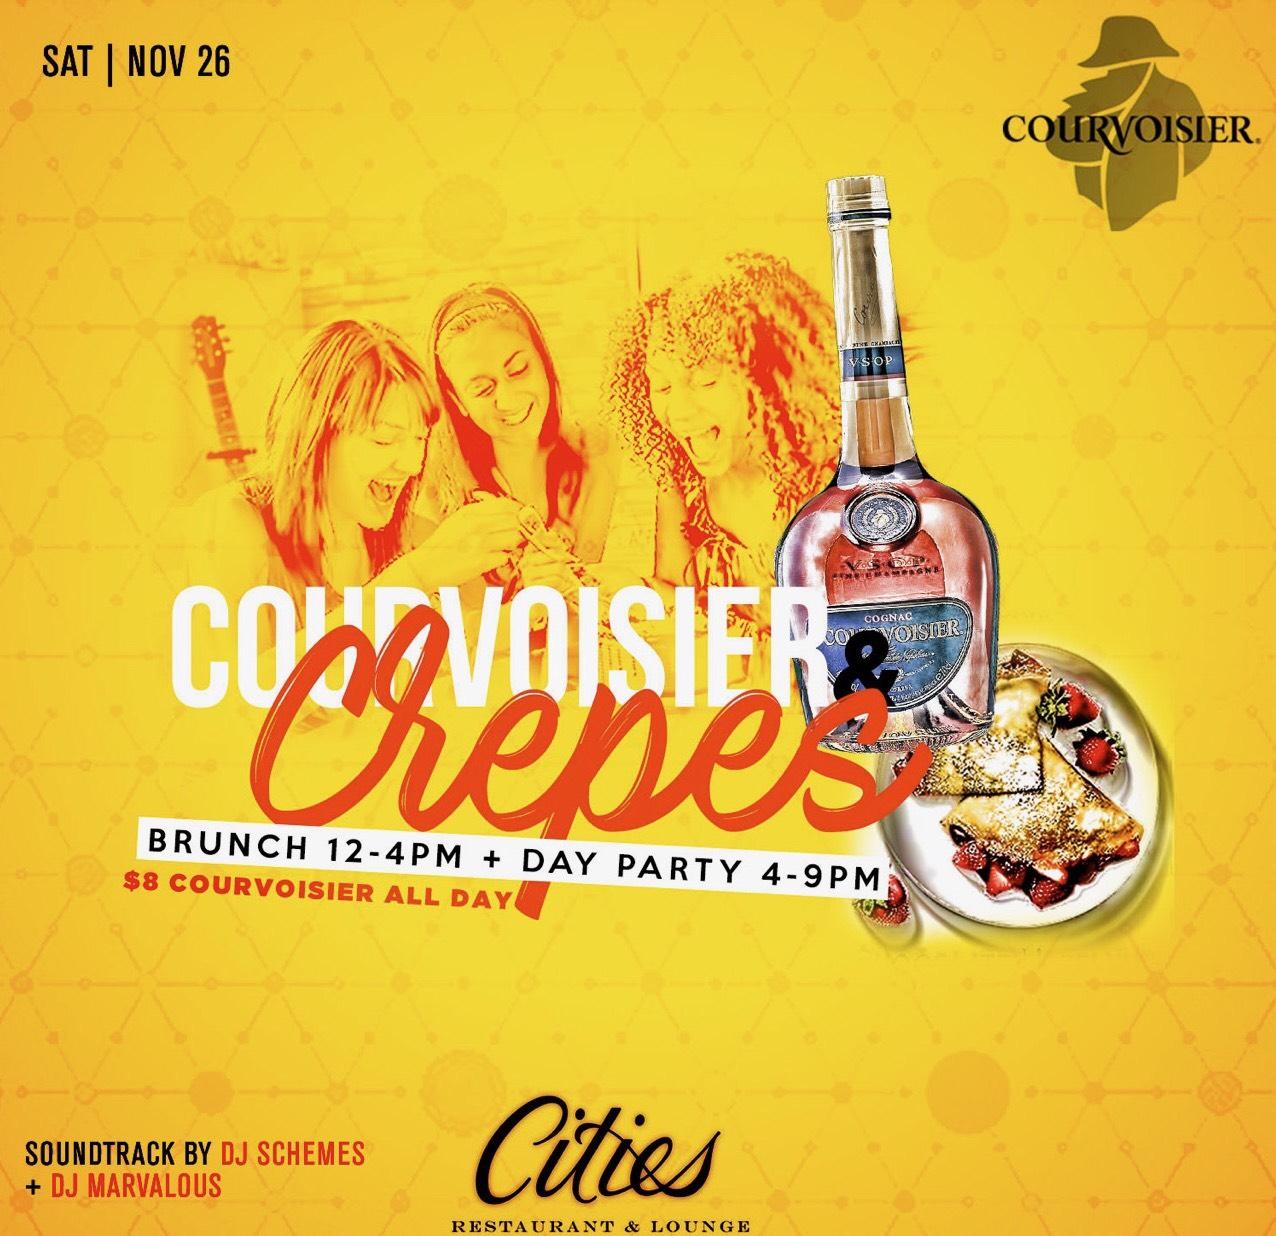 Courvoisier & Crepes